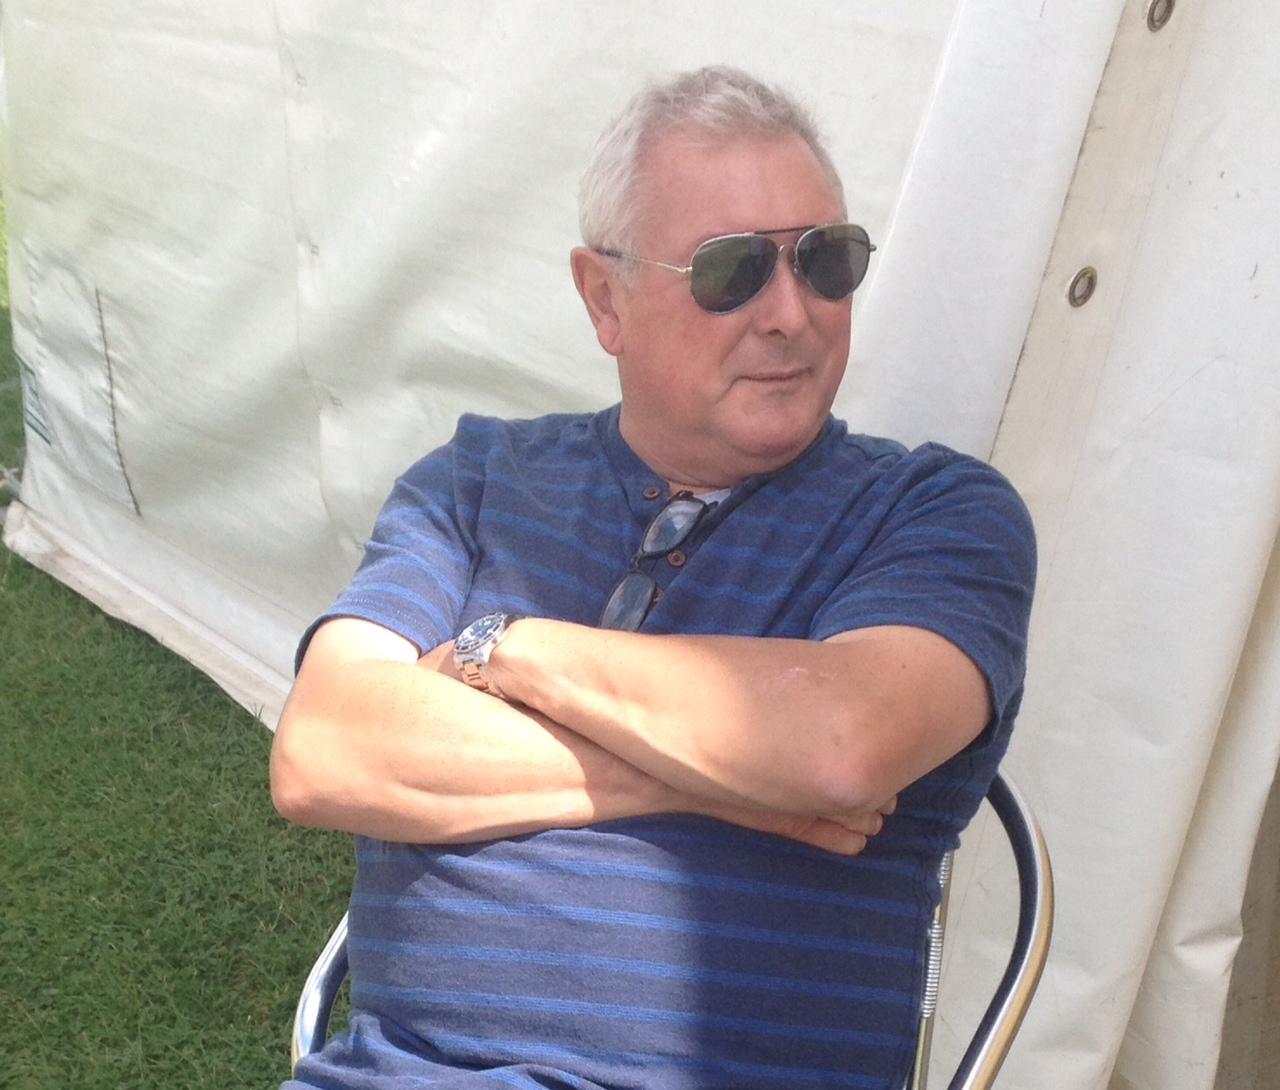 Geoff Billington attends ESUK 2016